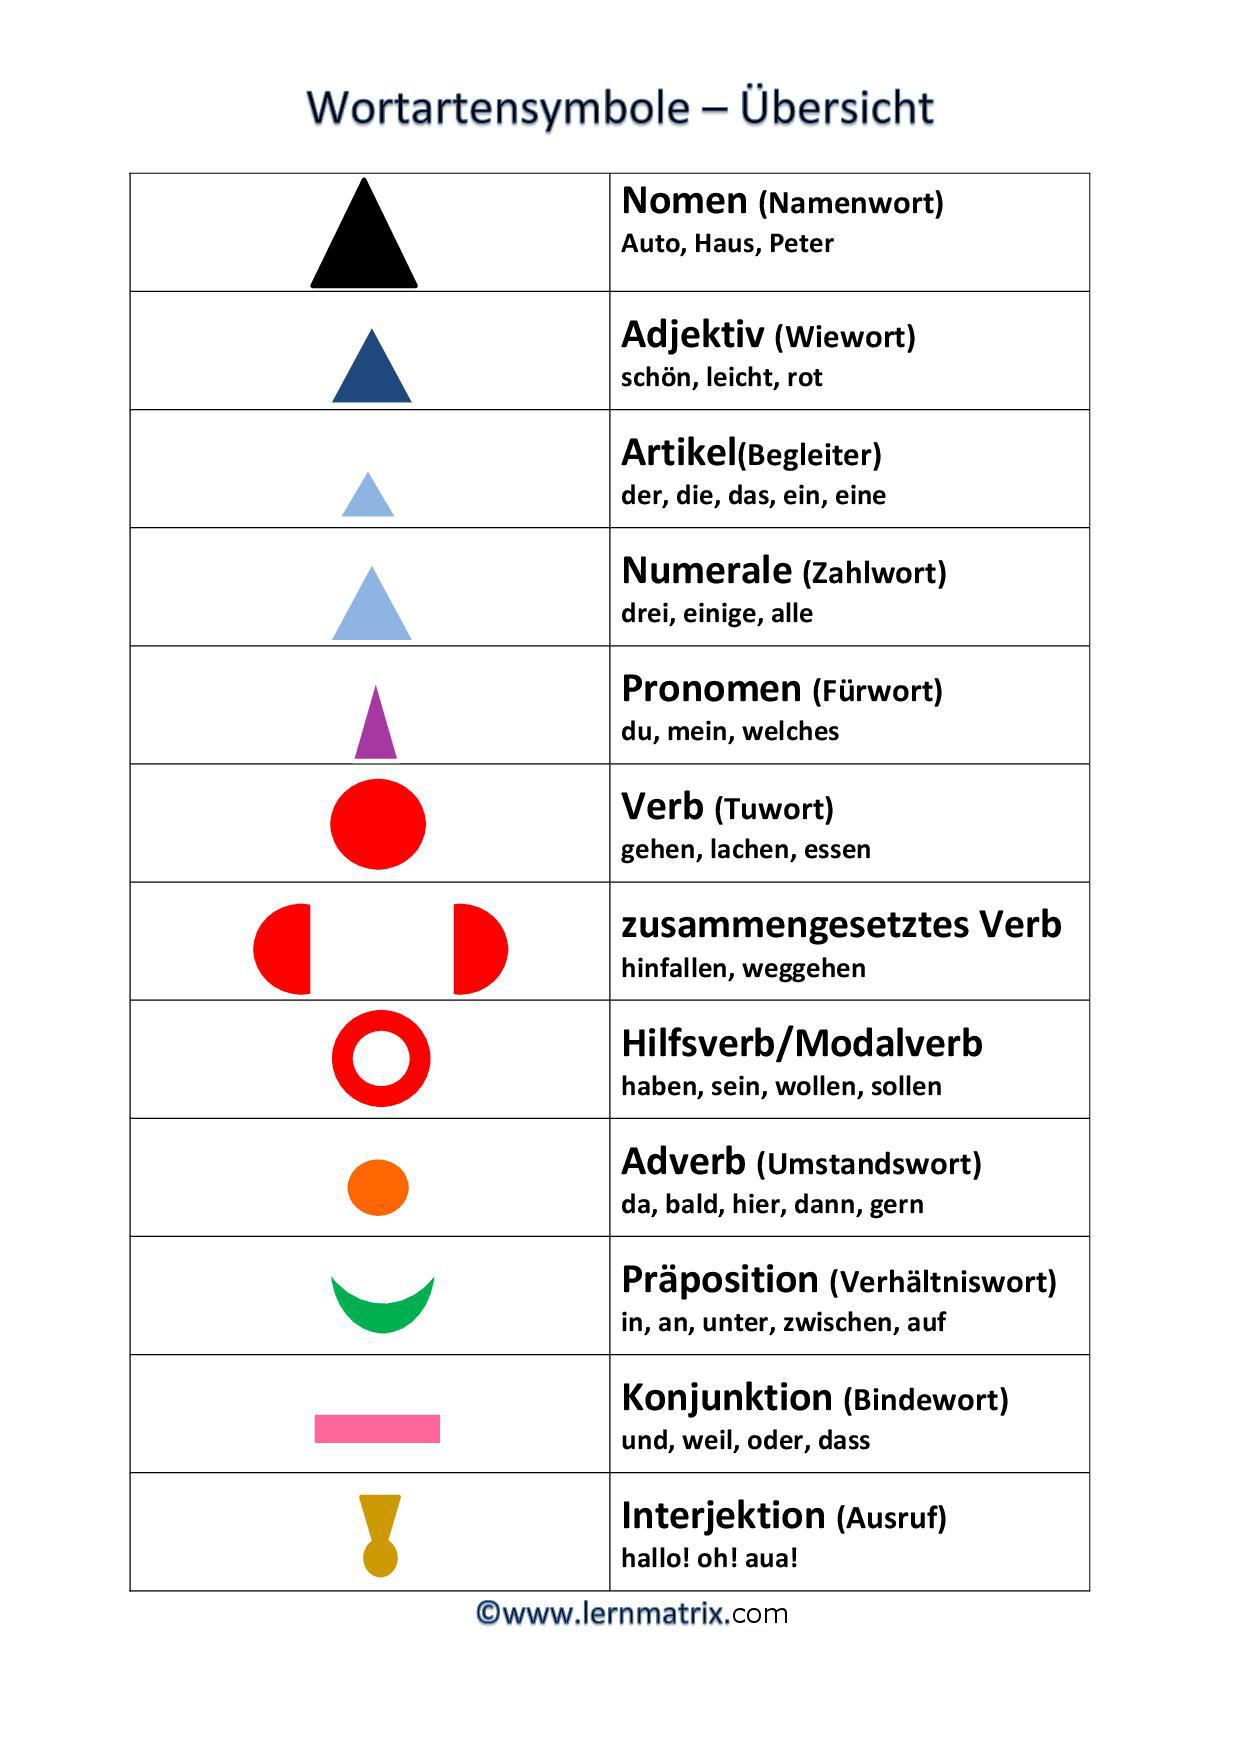 Nomen verben adjektive bestimmen online dating 3